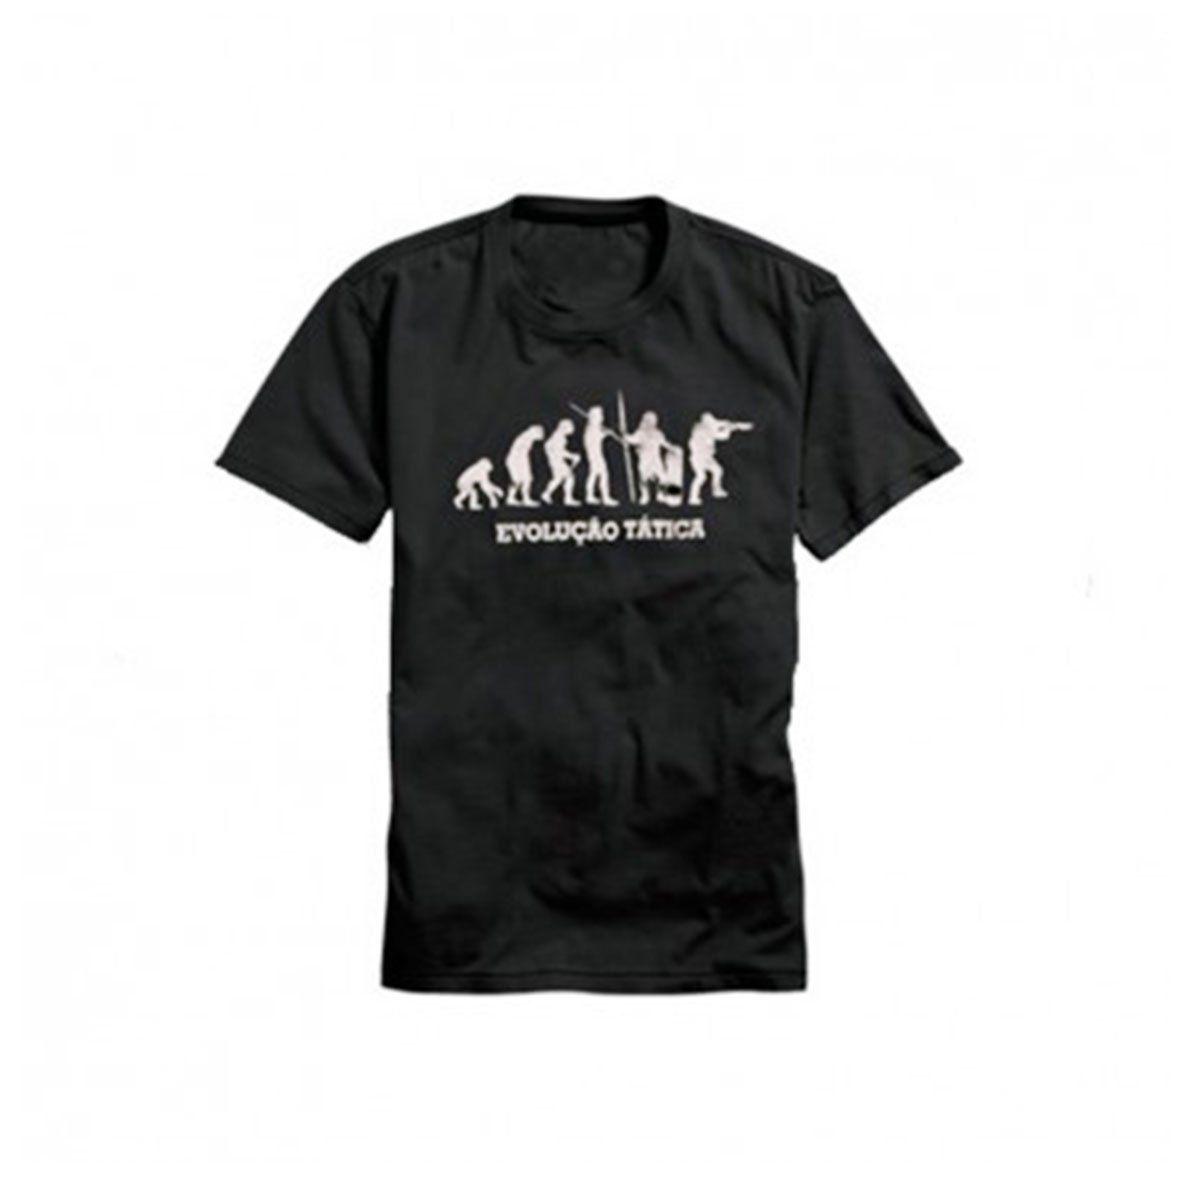 Camiseta estampada Evolucao Tatica - Malha Preto